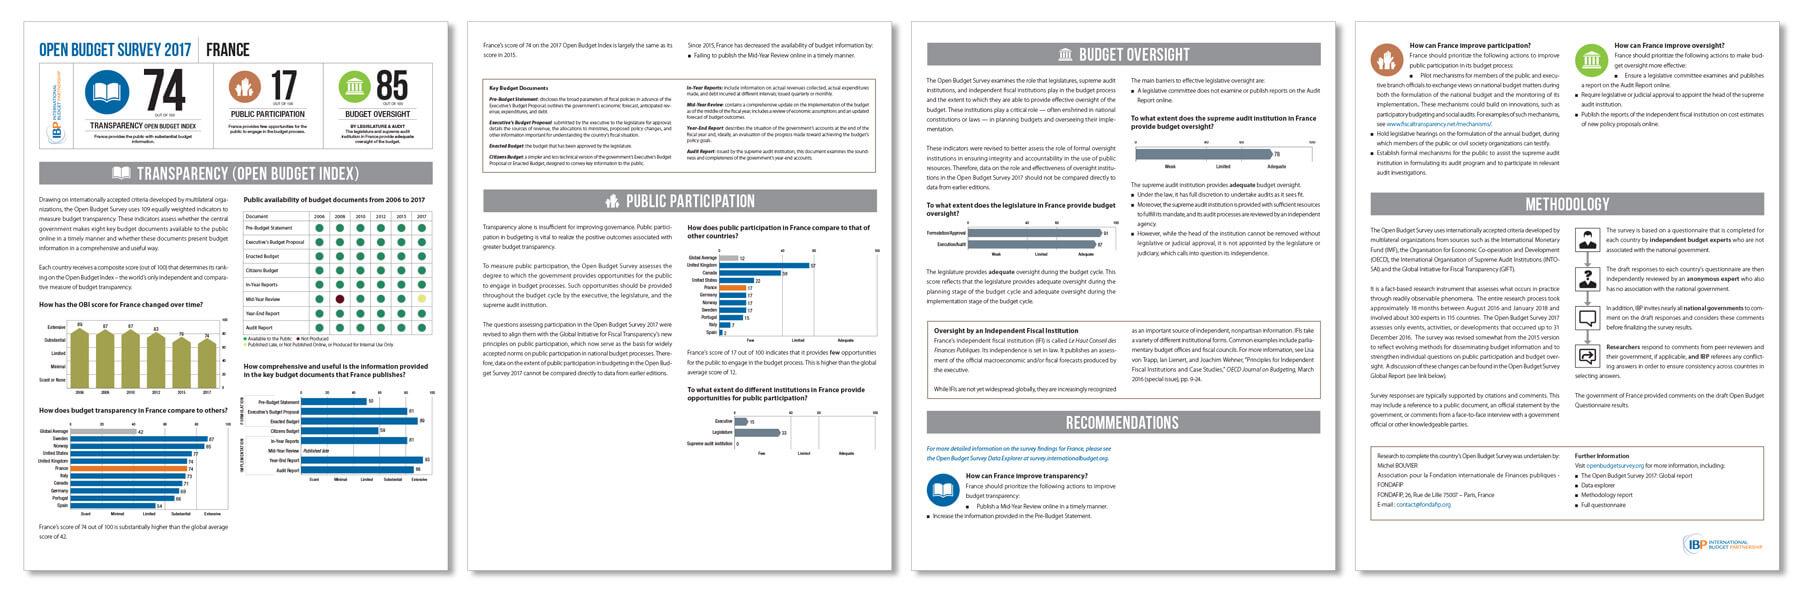 International Budget Partnership Open Budget Survey - Data Chart